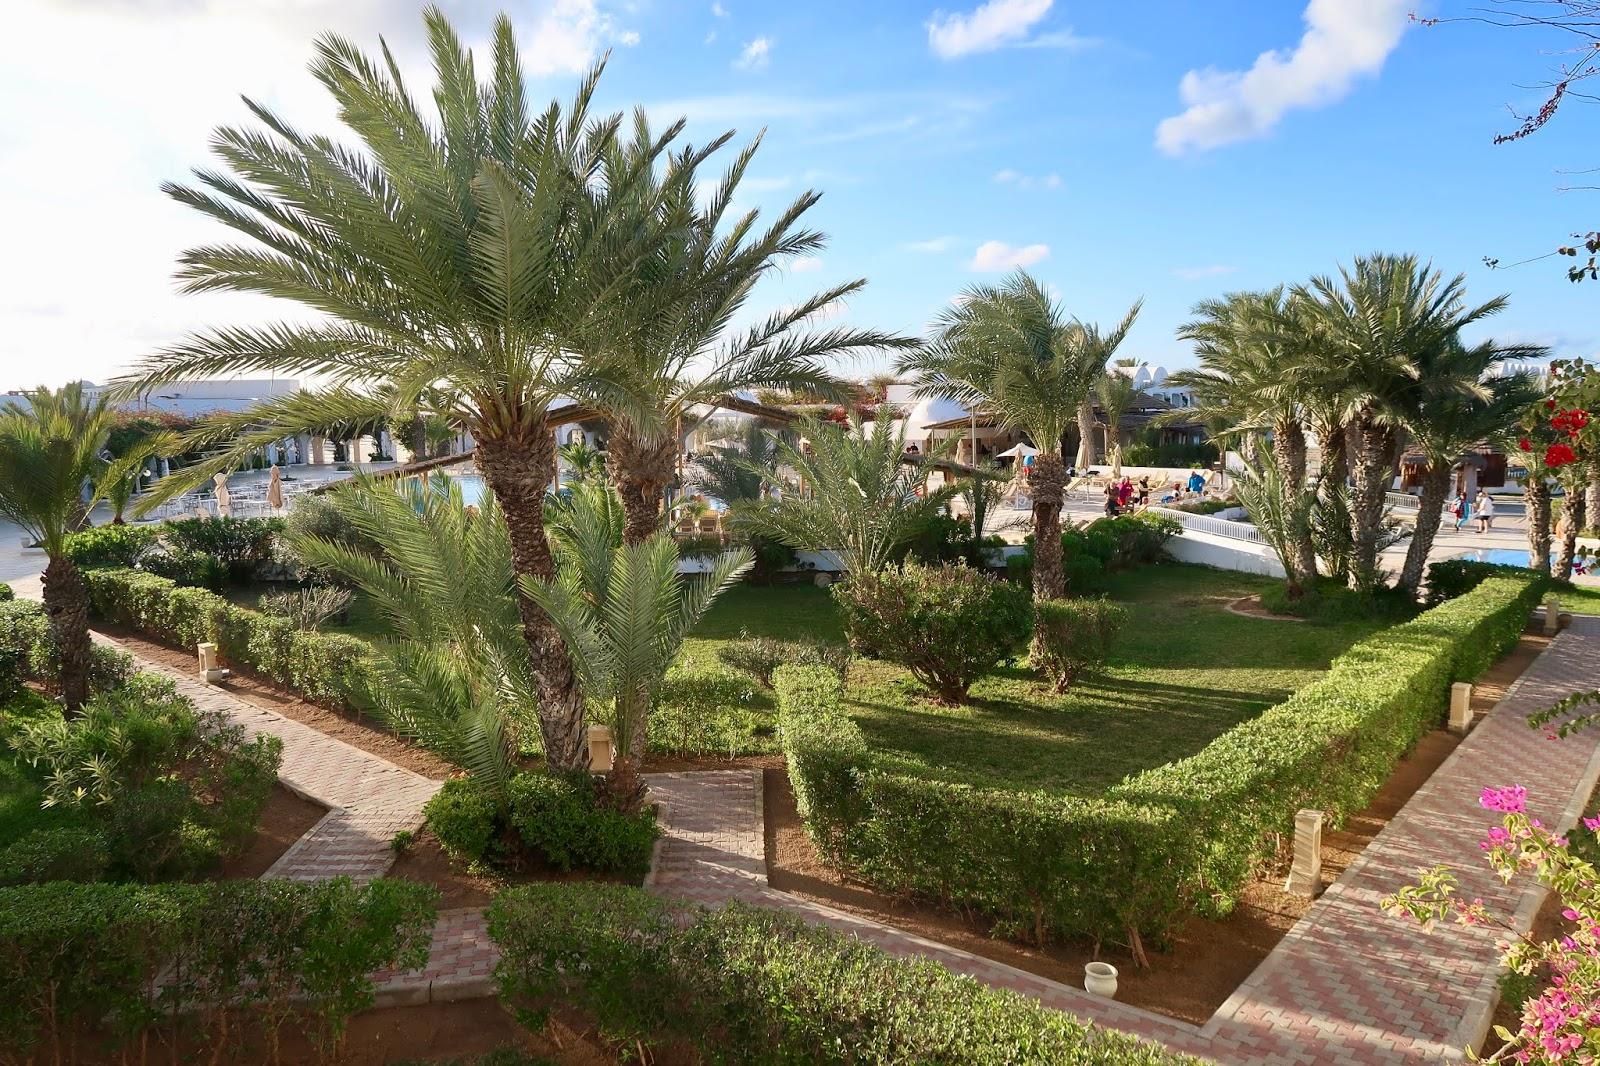 Seabel Rym Beach Djerba 2019